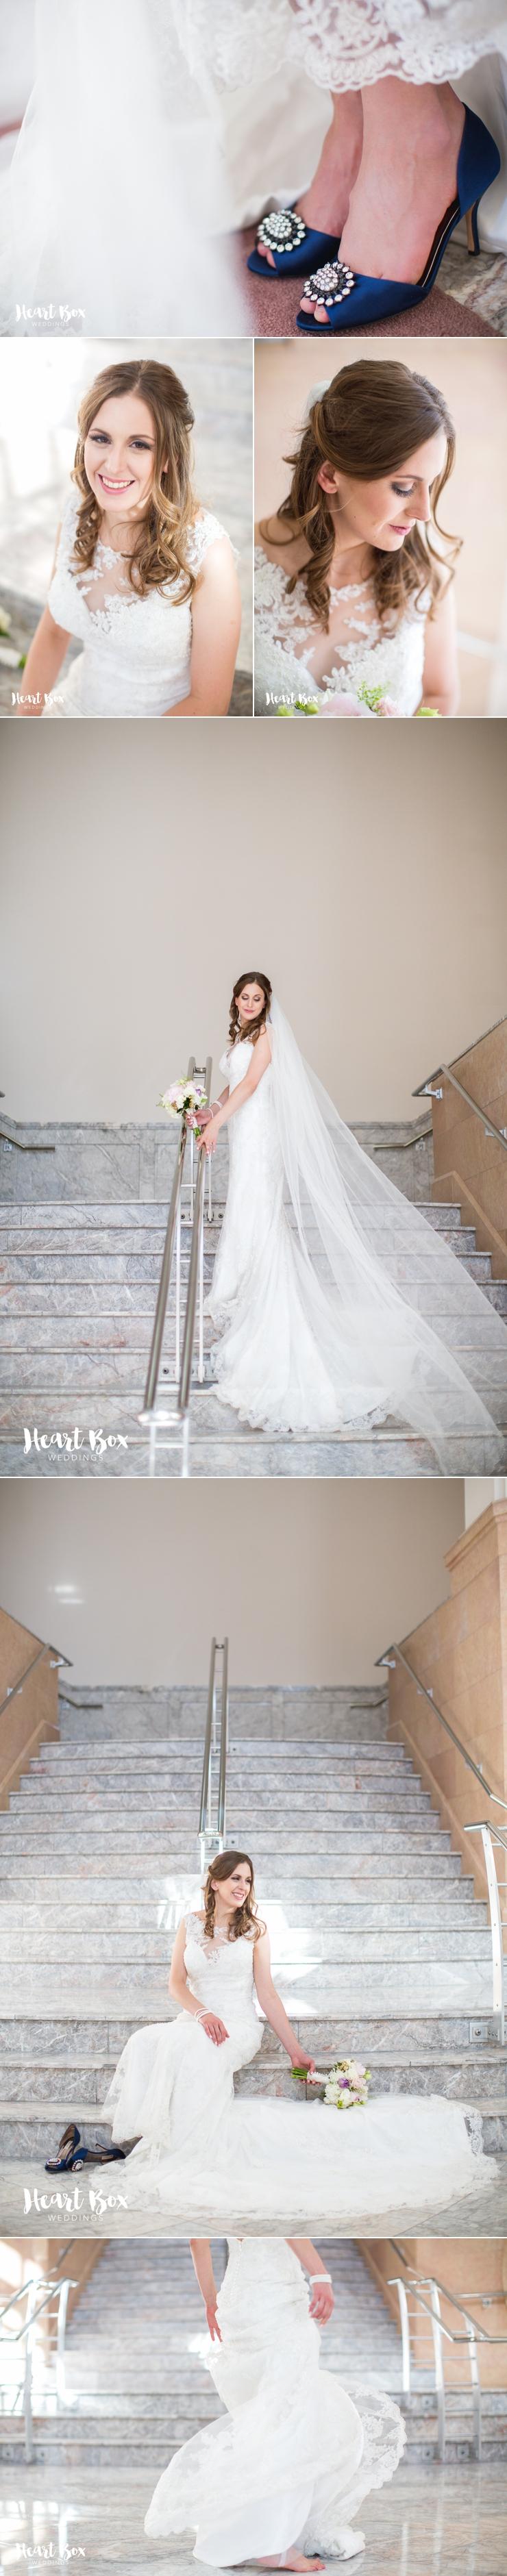 Sarah Lubrano Bridal Blog Collages 6.jpg